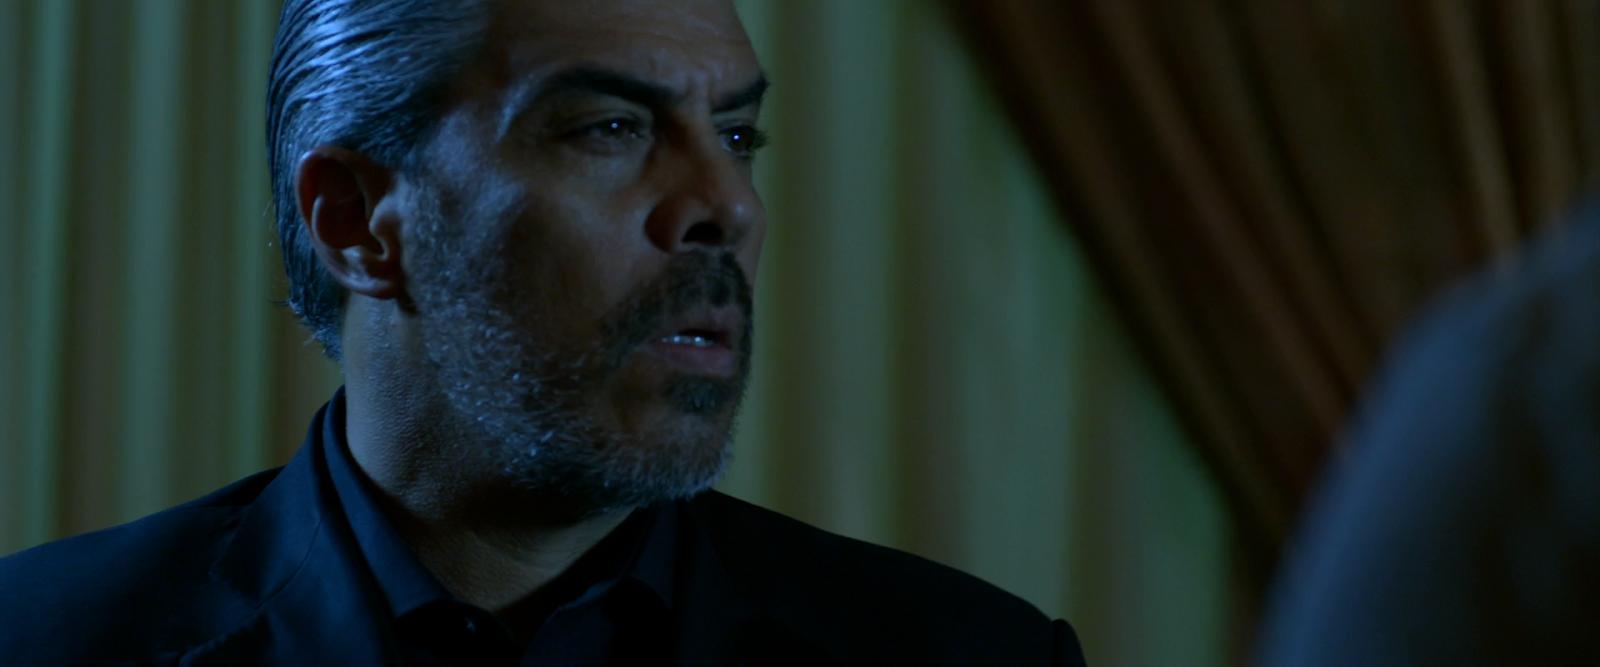 El infiltrado (Larceny) (2016) 1080p Latino - Ingles captura 4